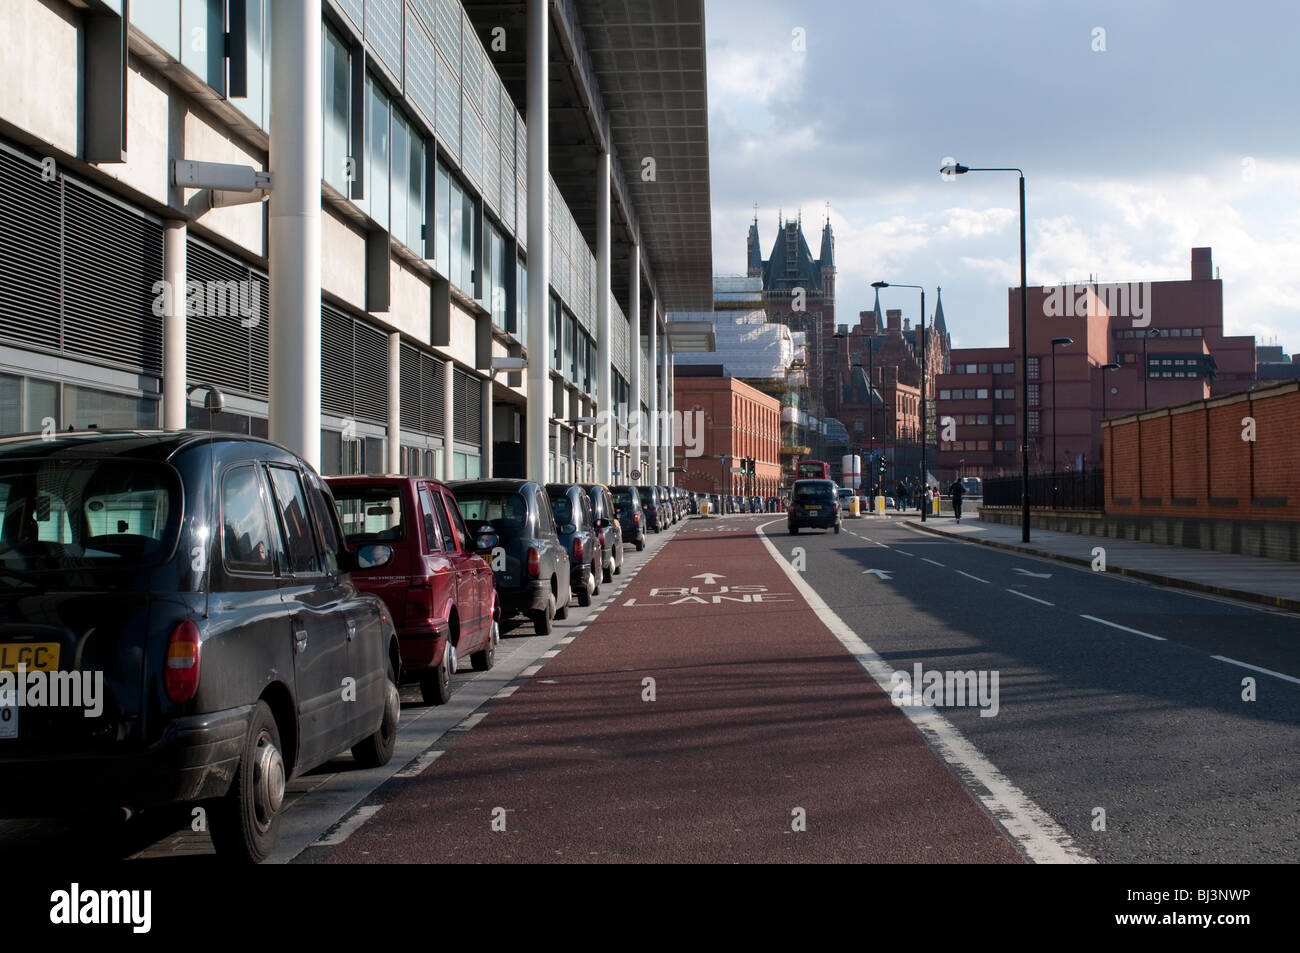 London cabs lined up along St Pancras Station, London, UK - Stock Image